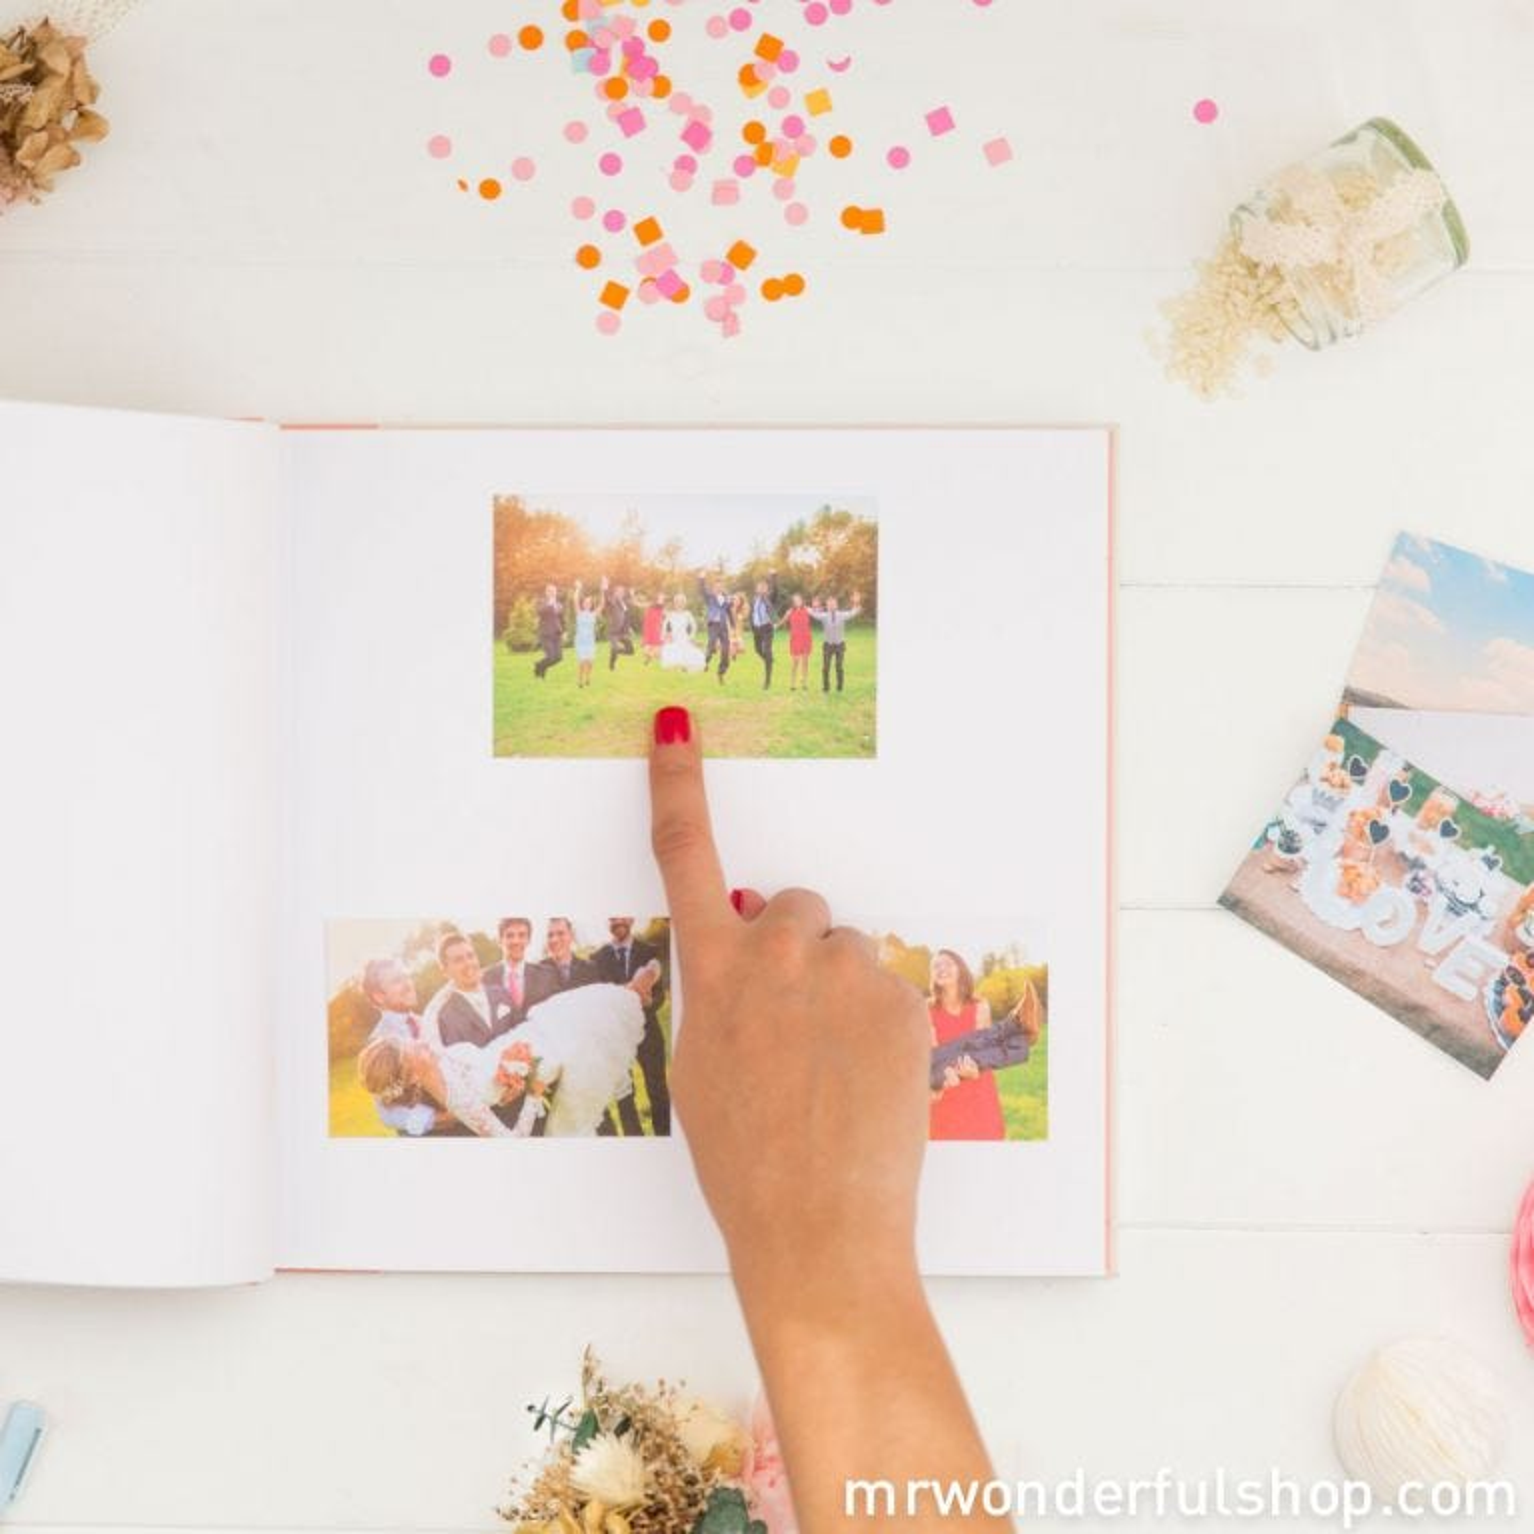 Our unofficial wedding album